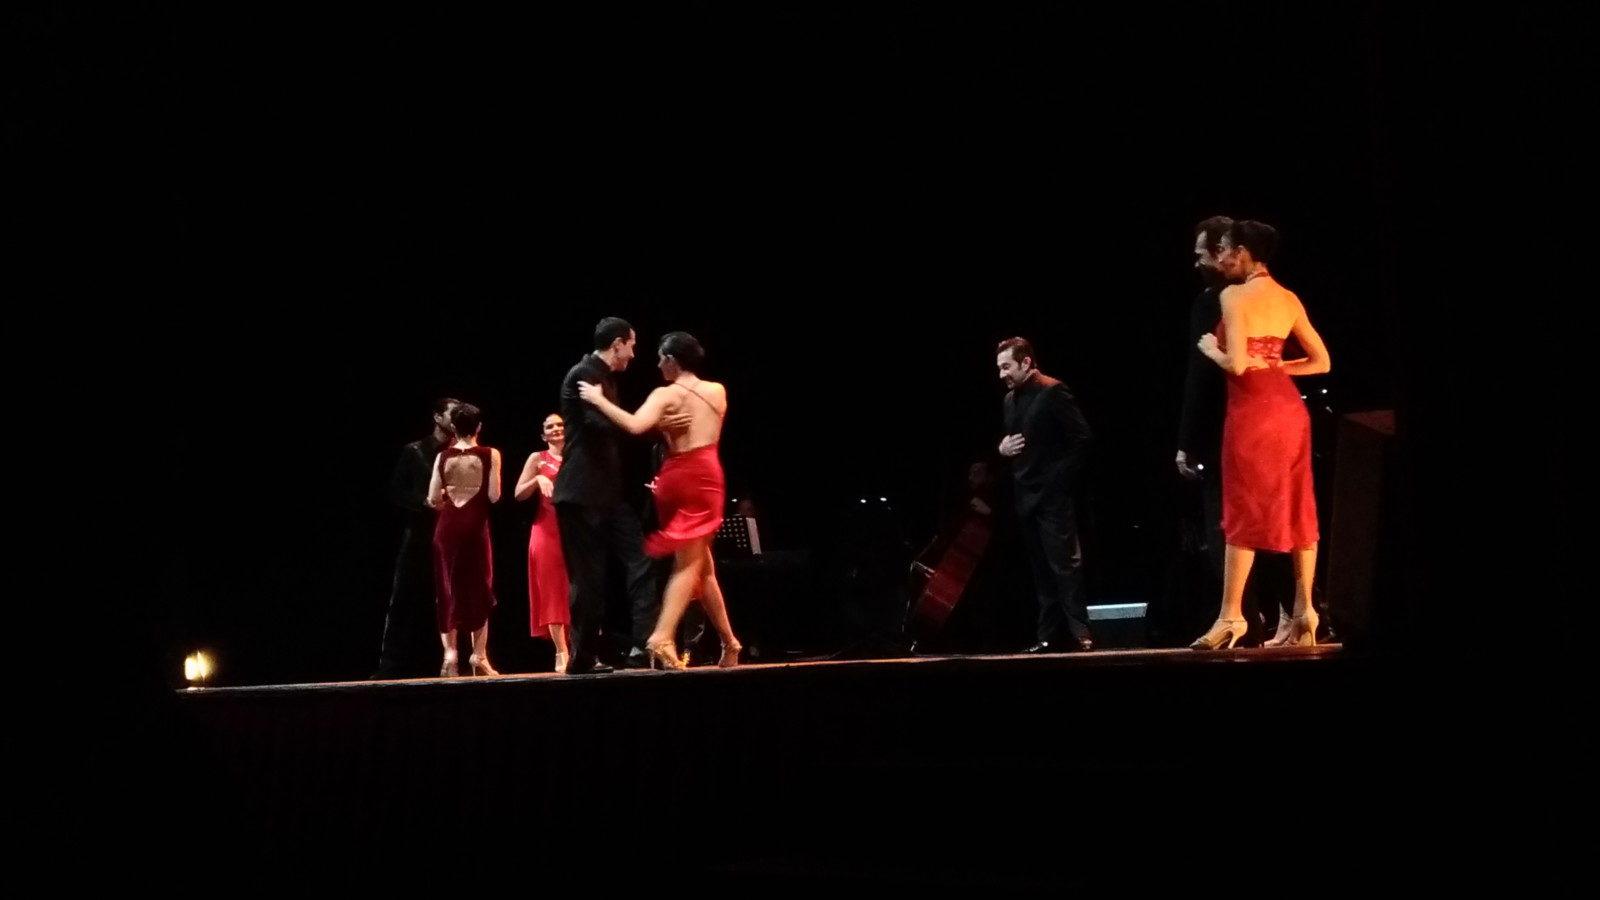 Tango - Giuditta Pasta- Saronno - 8 2 19 (8)